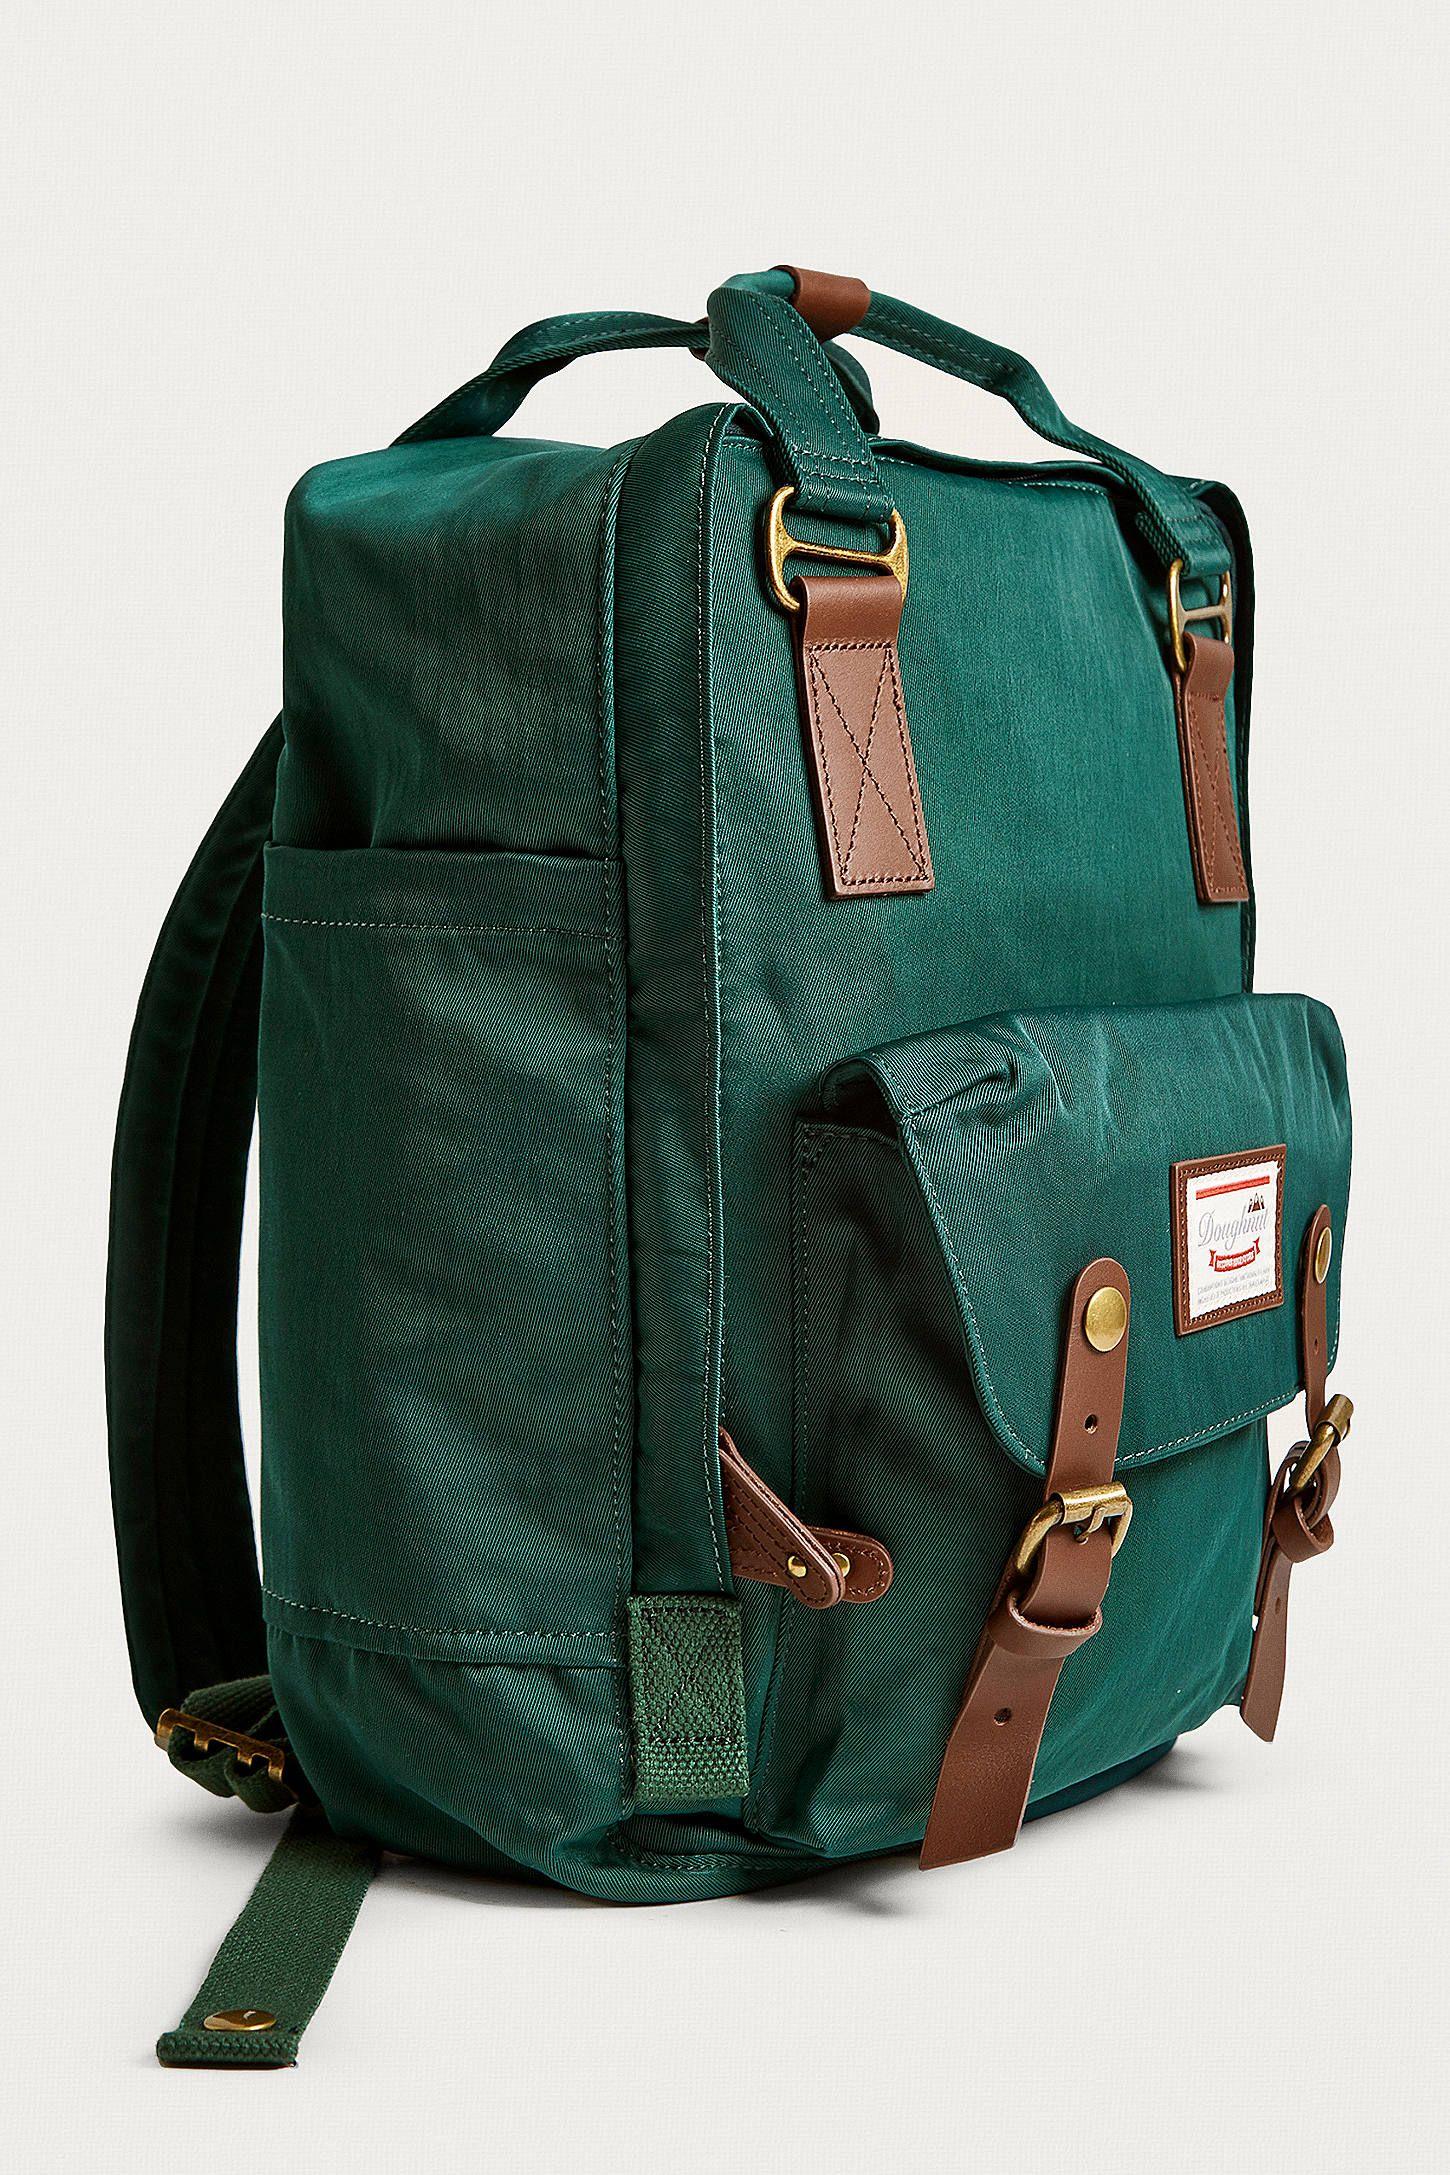 af007e477339 Doughnut Macaroon Seaweed Green Backpack | Urban Outfitters ...